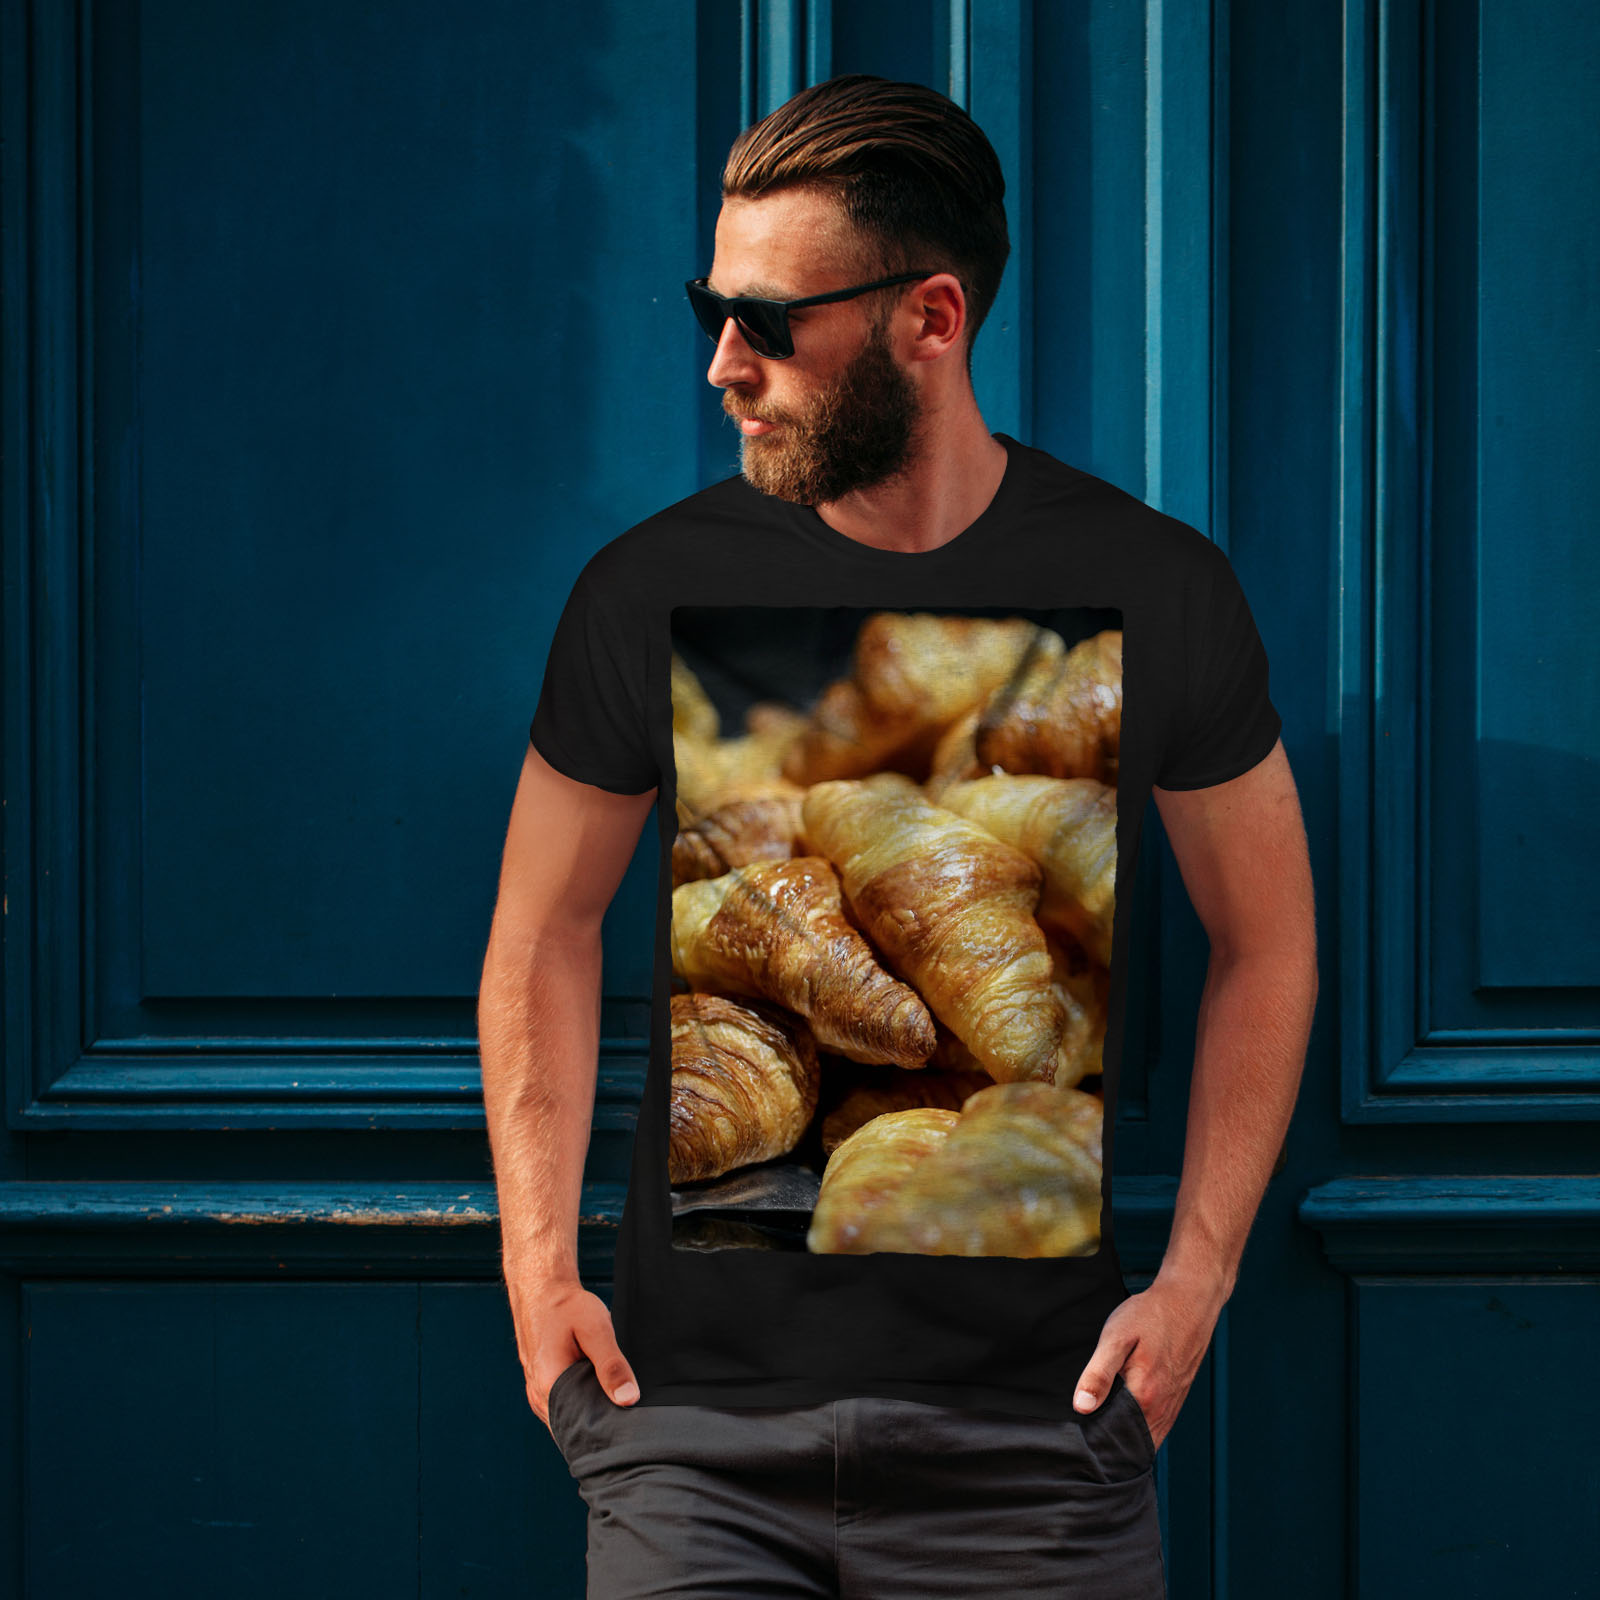 miniature 4 - Wellcoda Bakery Kitchen Sweet Mens T-shirt, Dessert Graphic Design Printed Tee